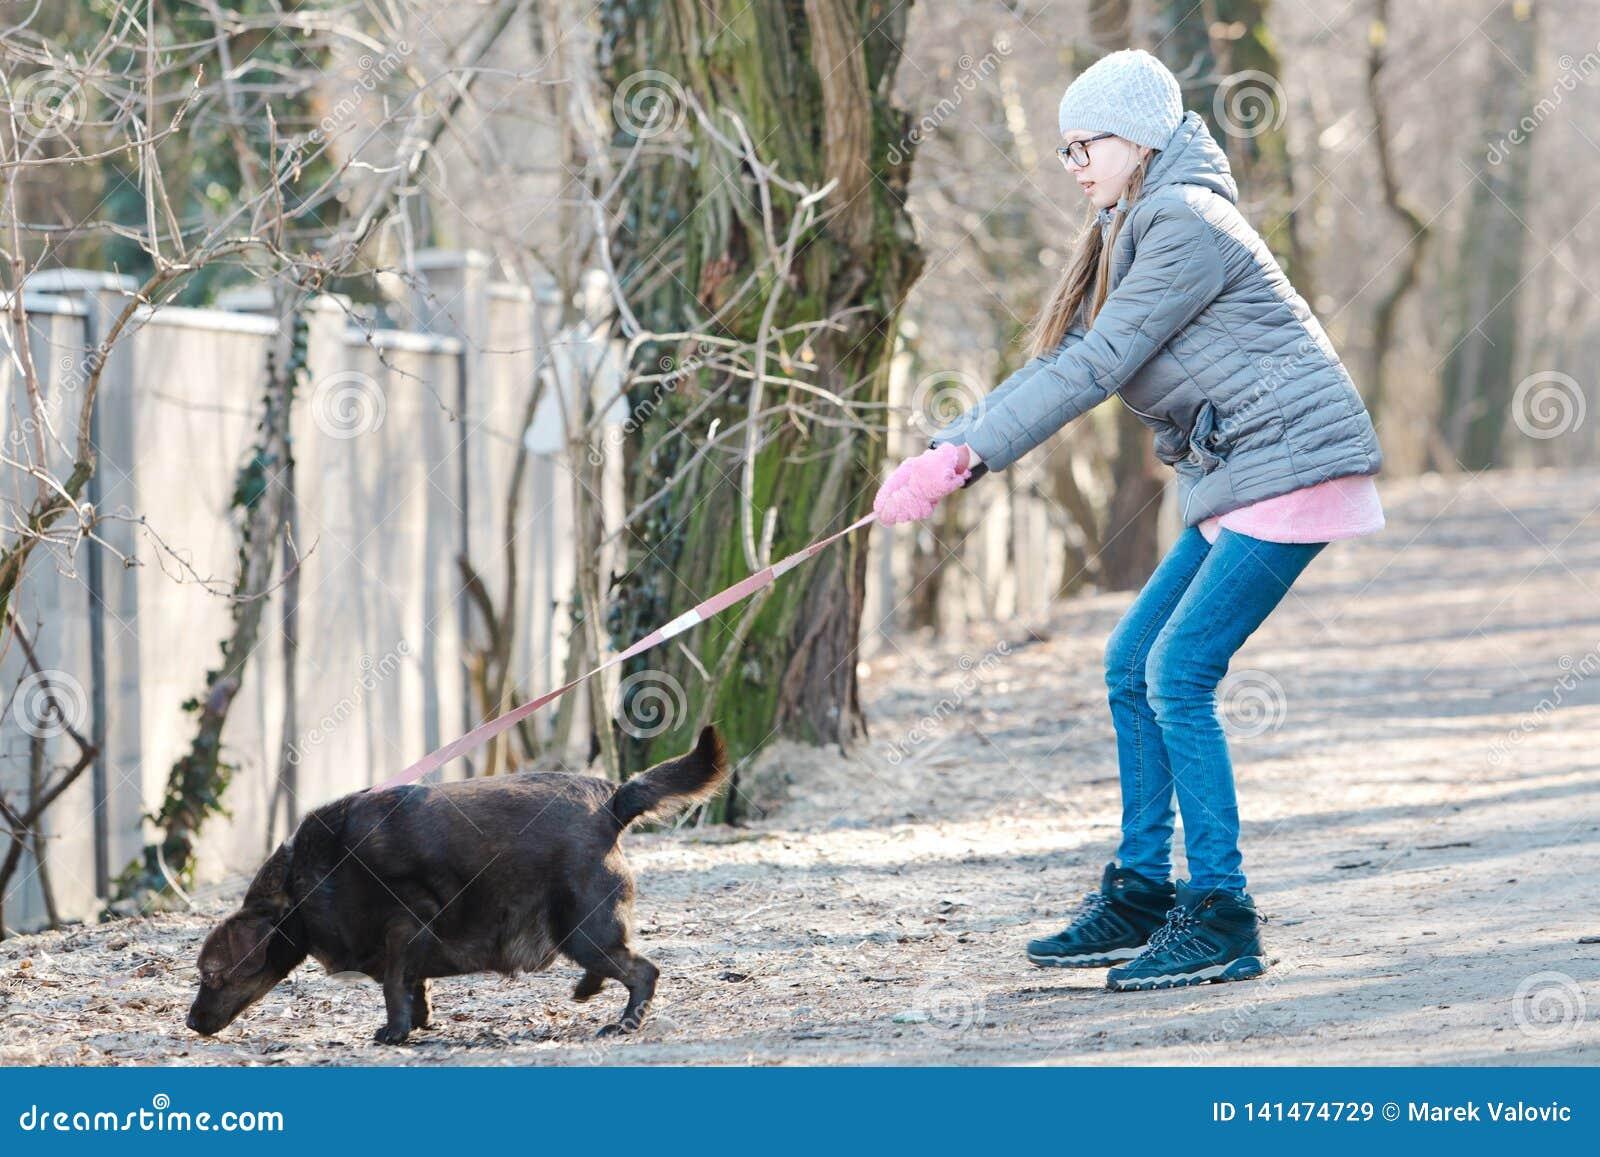 Teen girl walking a dog - A dog is pulling